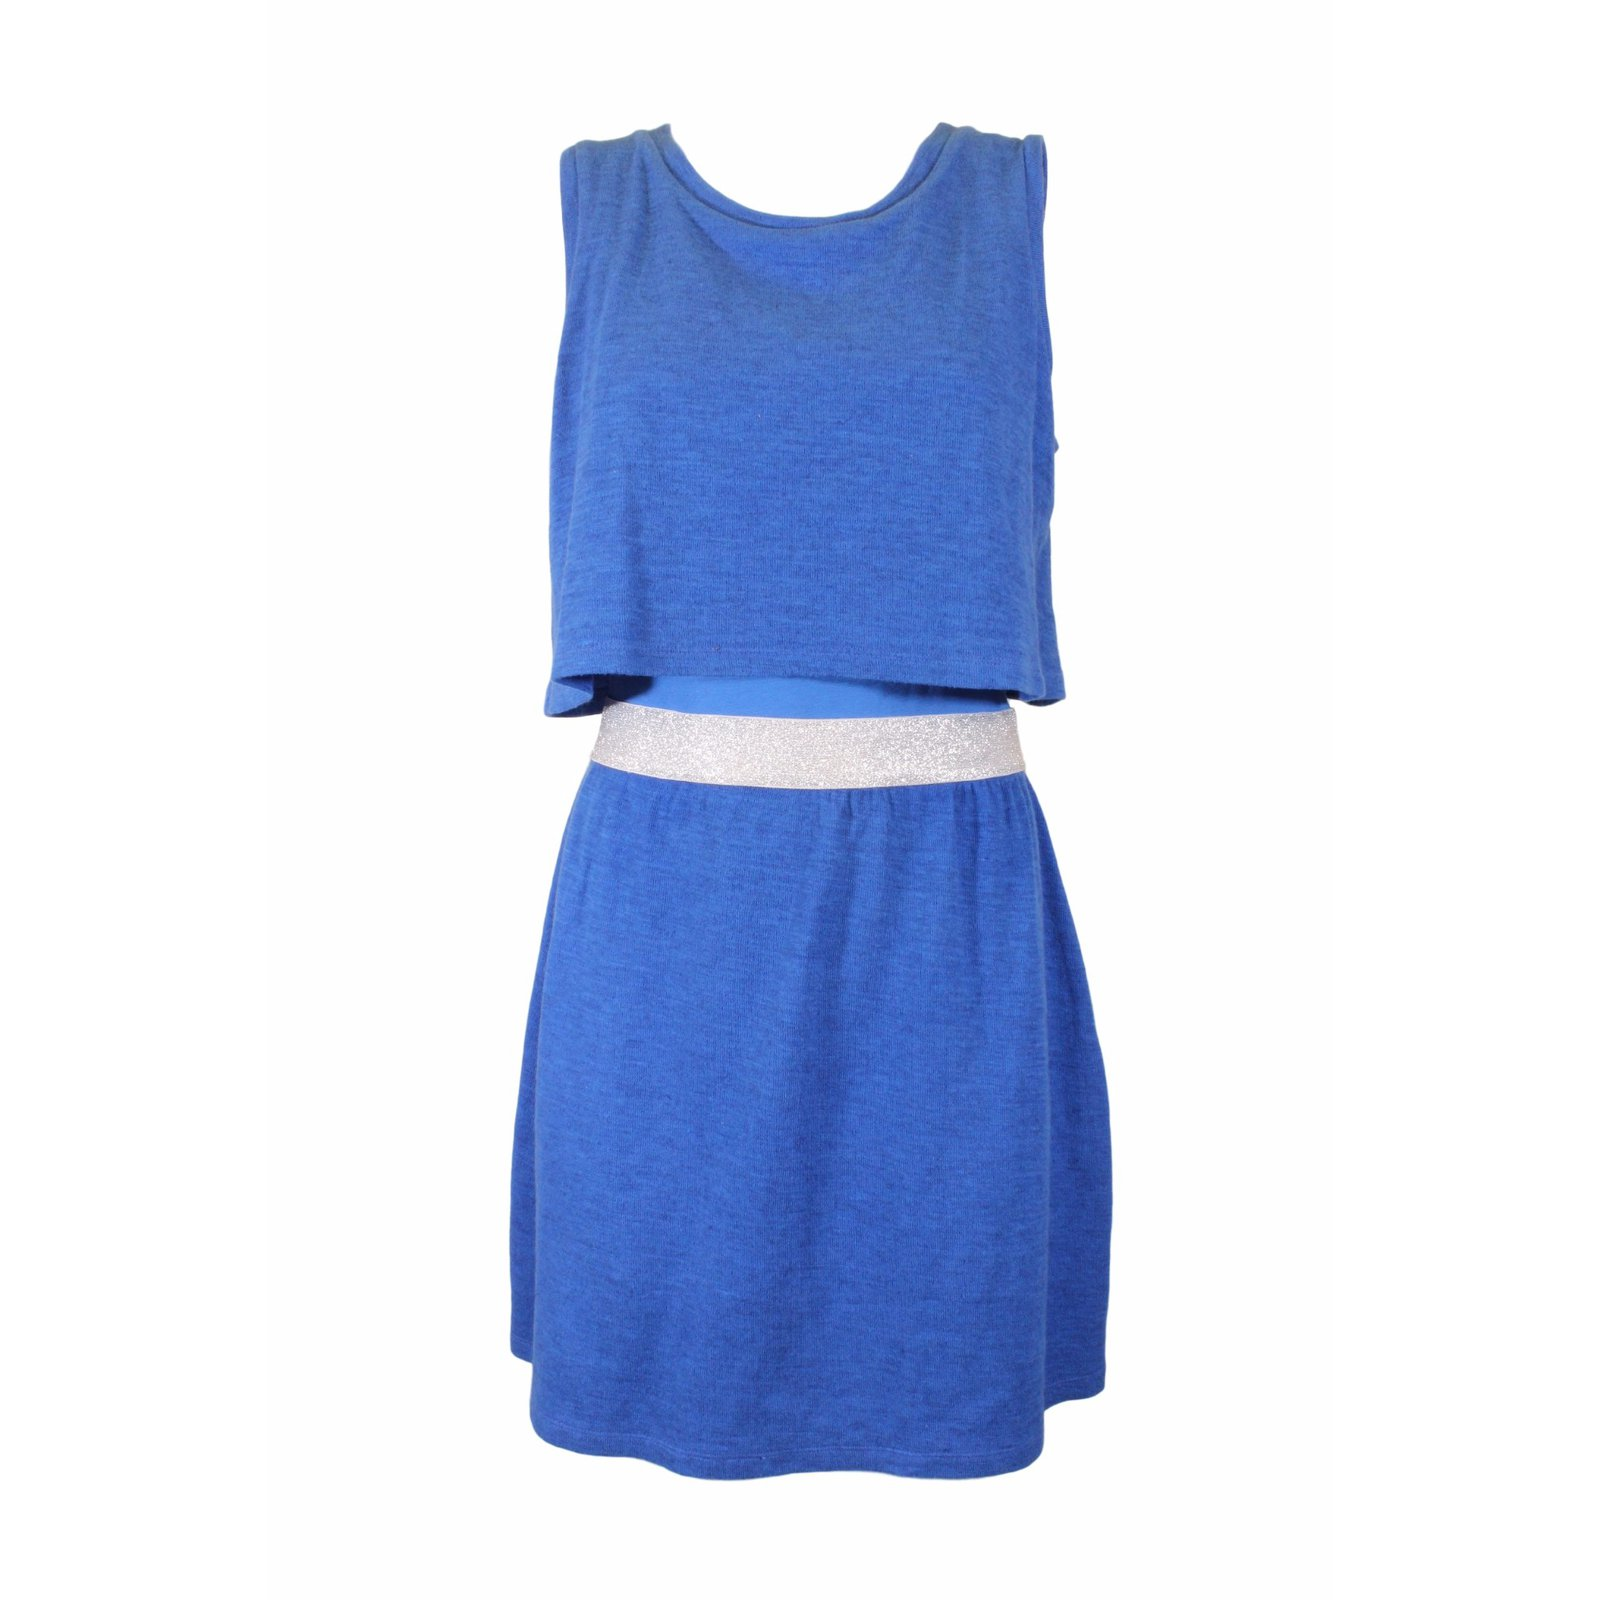 Bleu Coton Tralala Robe Ref 14574 Claudie Pierlot Robes Closet Joli HwqPxXAH